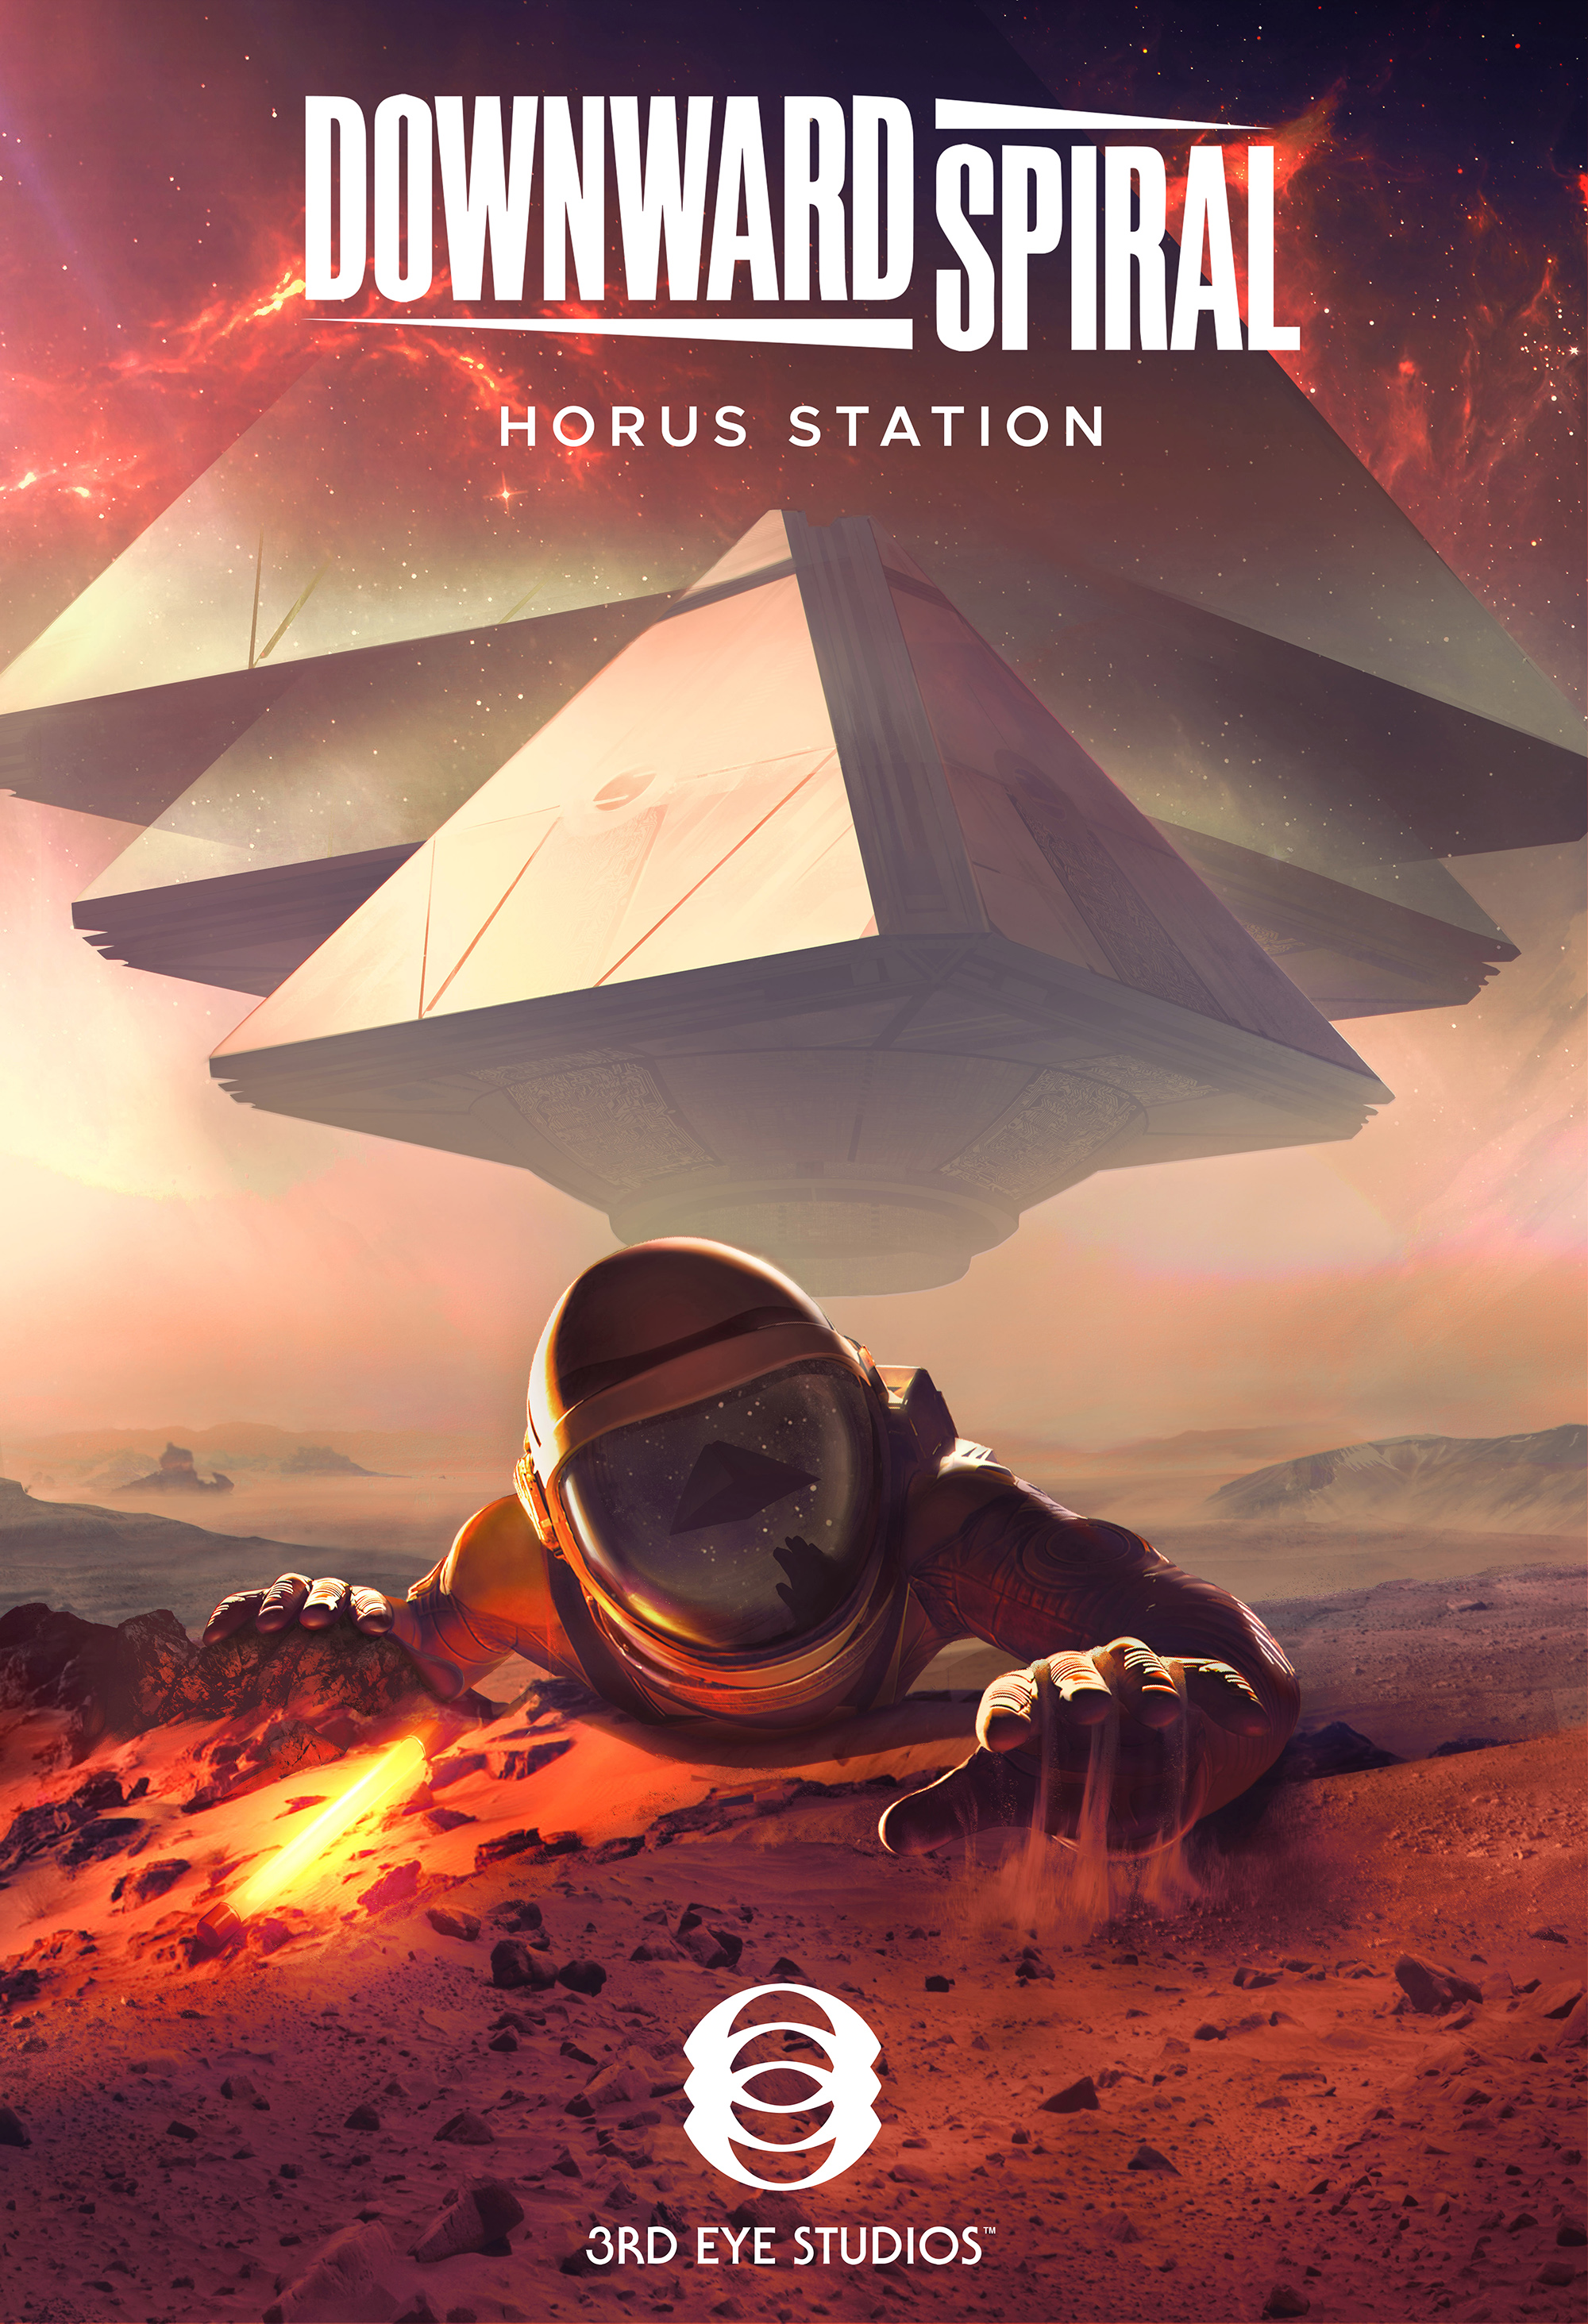 Downward Spiral Horus Station Key Art